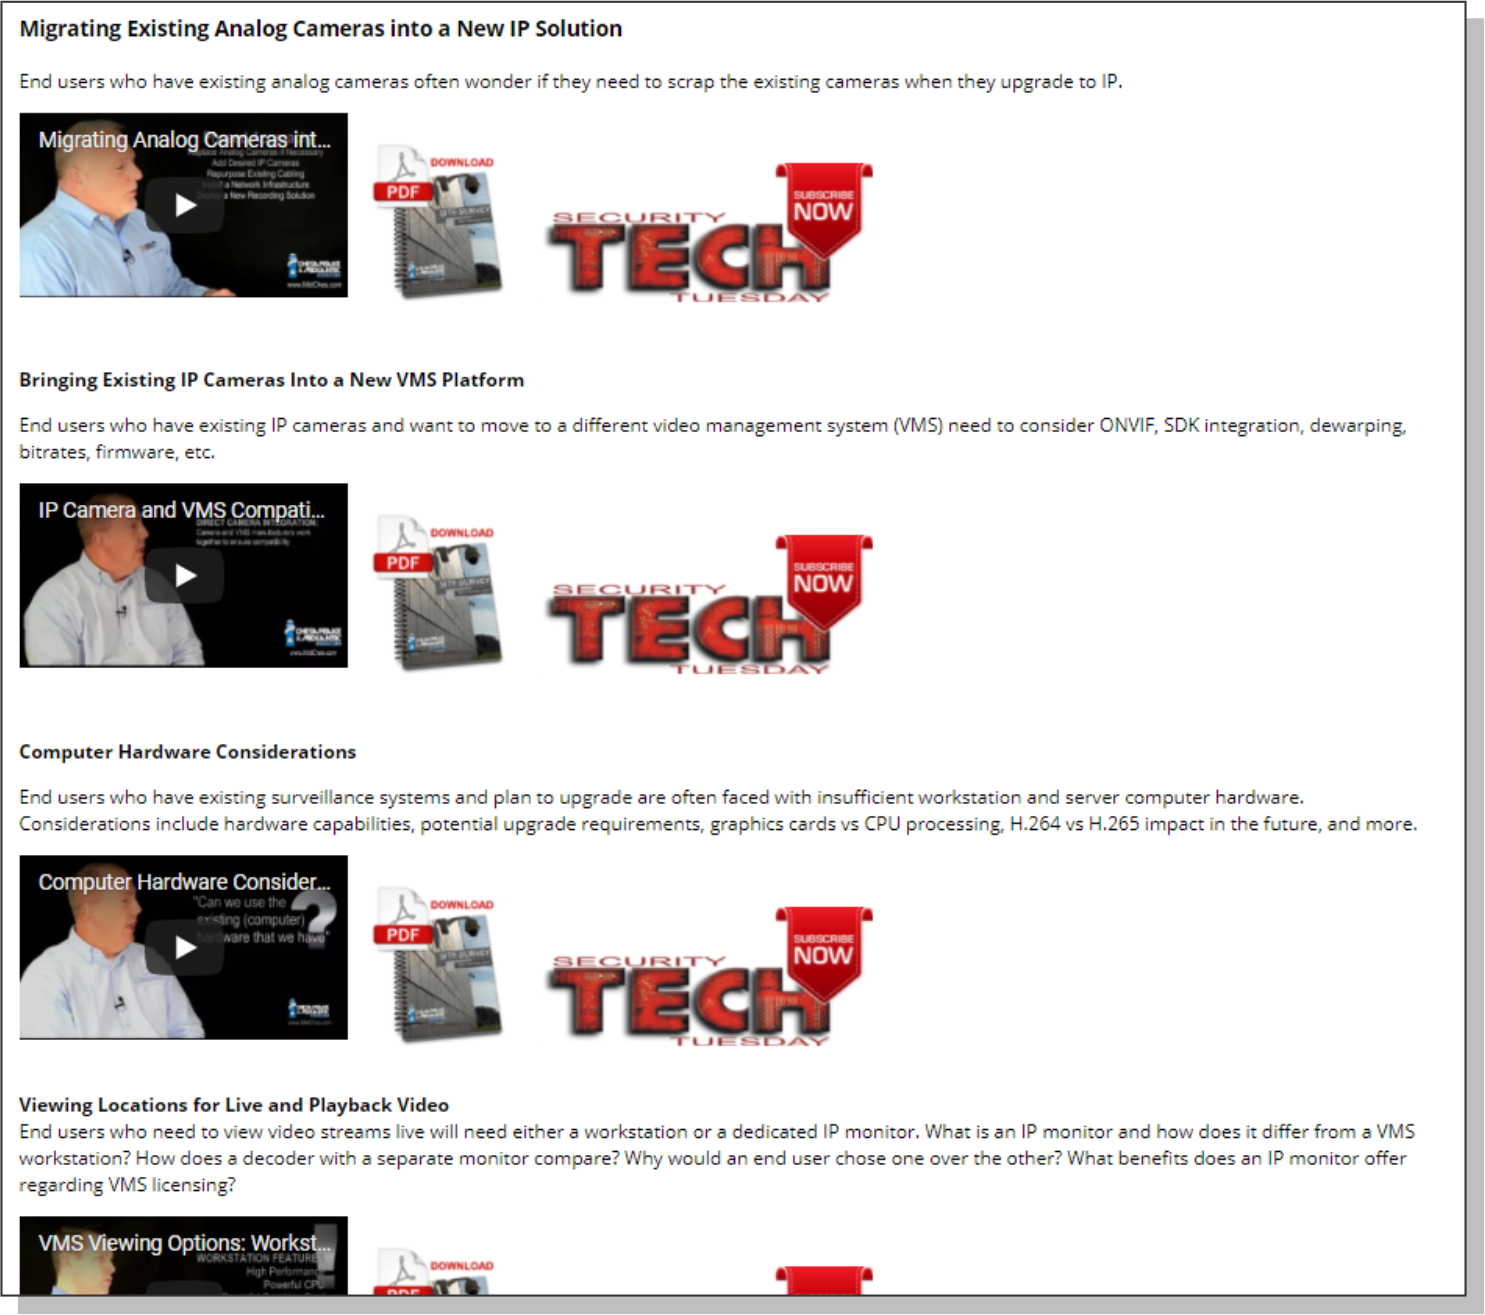 IP Video Basics Web Portal Image.png